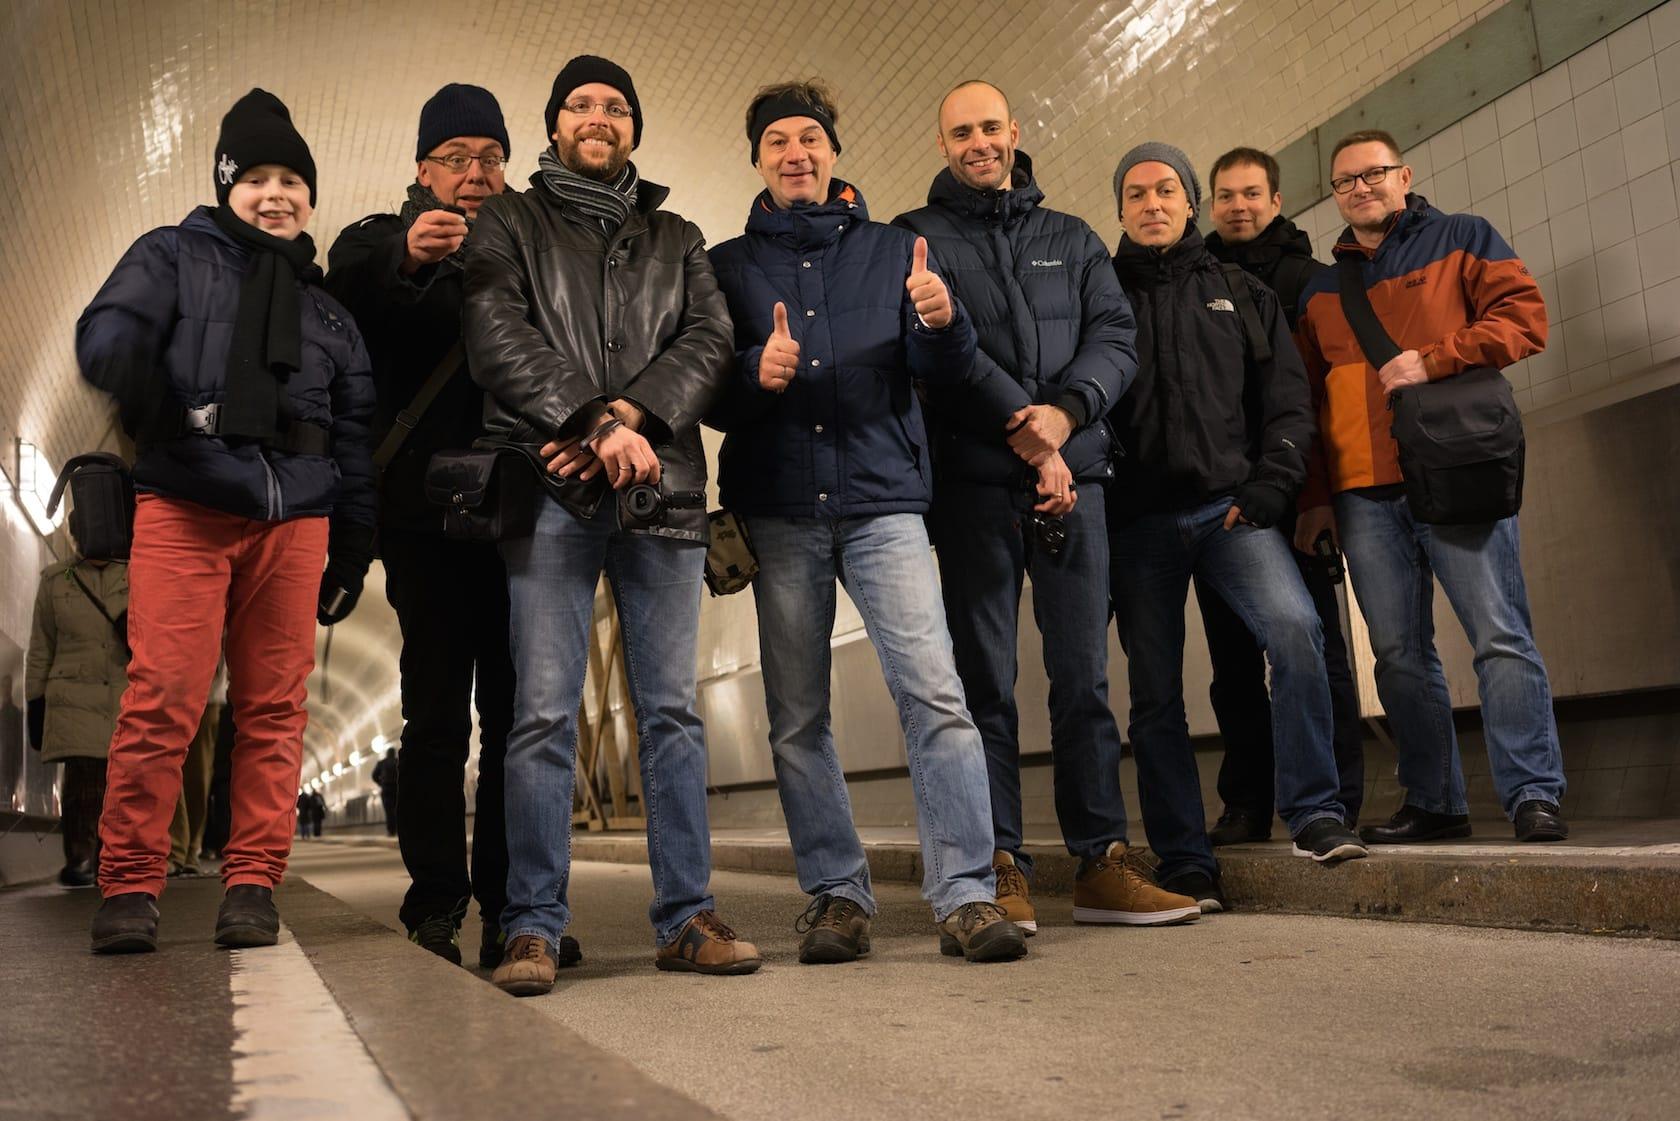 Hamburg Street Hunt members